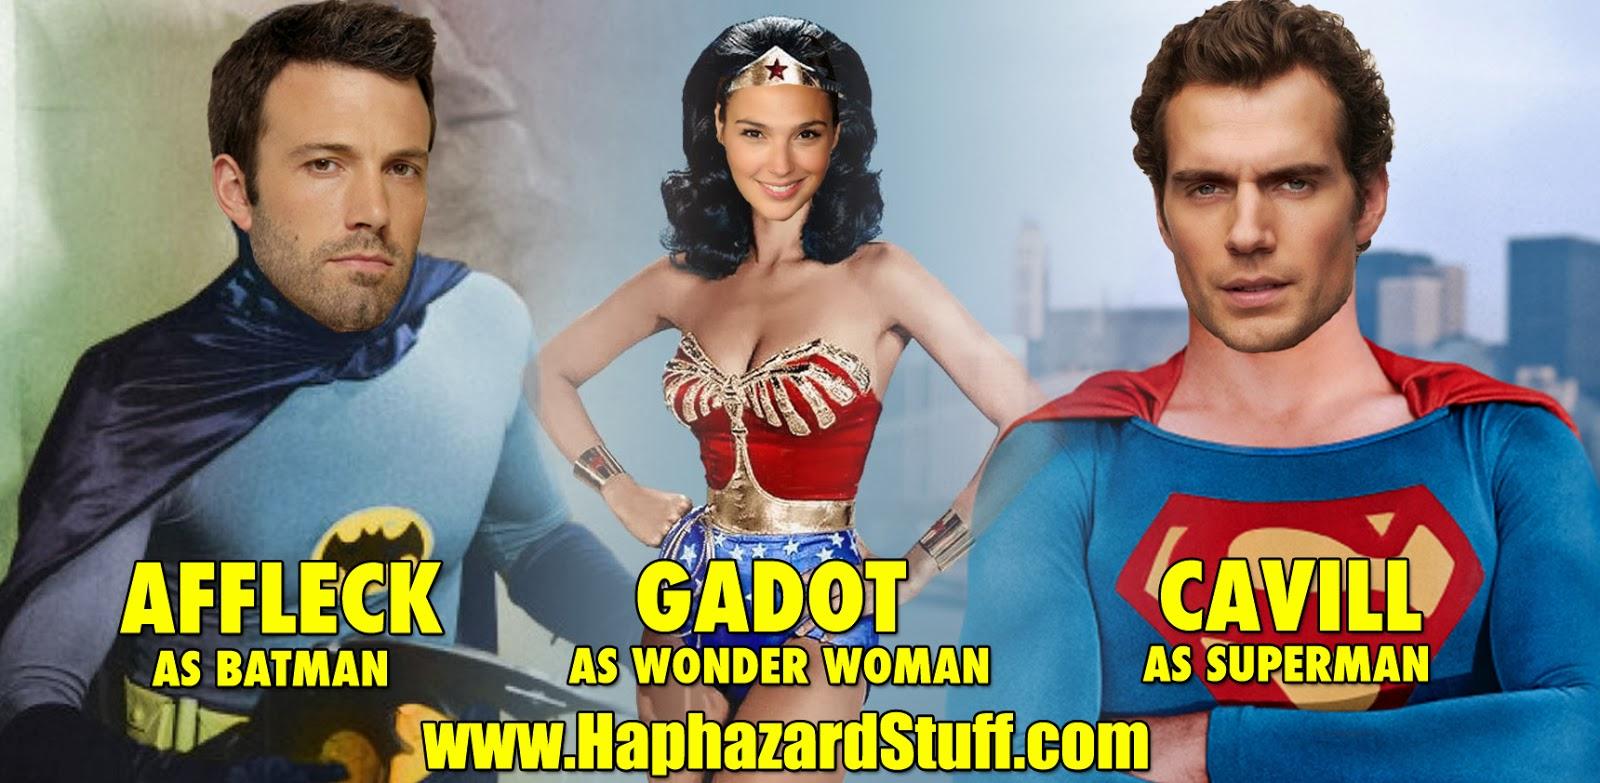 http://2.bp.blogspot.com/-Z9NlYyFArTc/UqKKaa8XwxI/AAAAAAAAKDk/KMJbRSenFLo/s1600/Affleck+Batman+Gadot+Wonder+Woman+Cavill+Superman.jpg